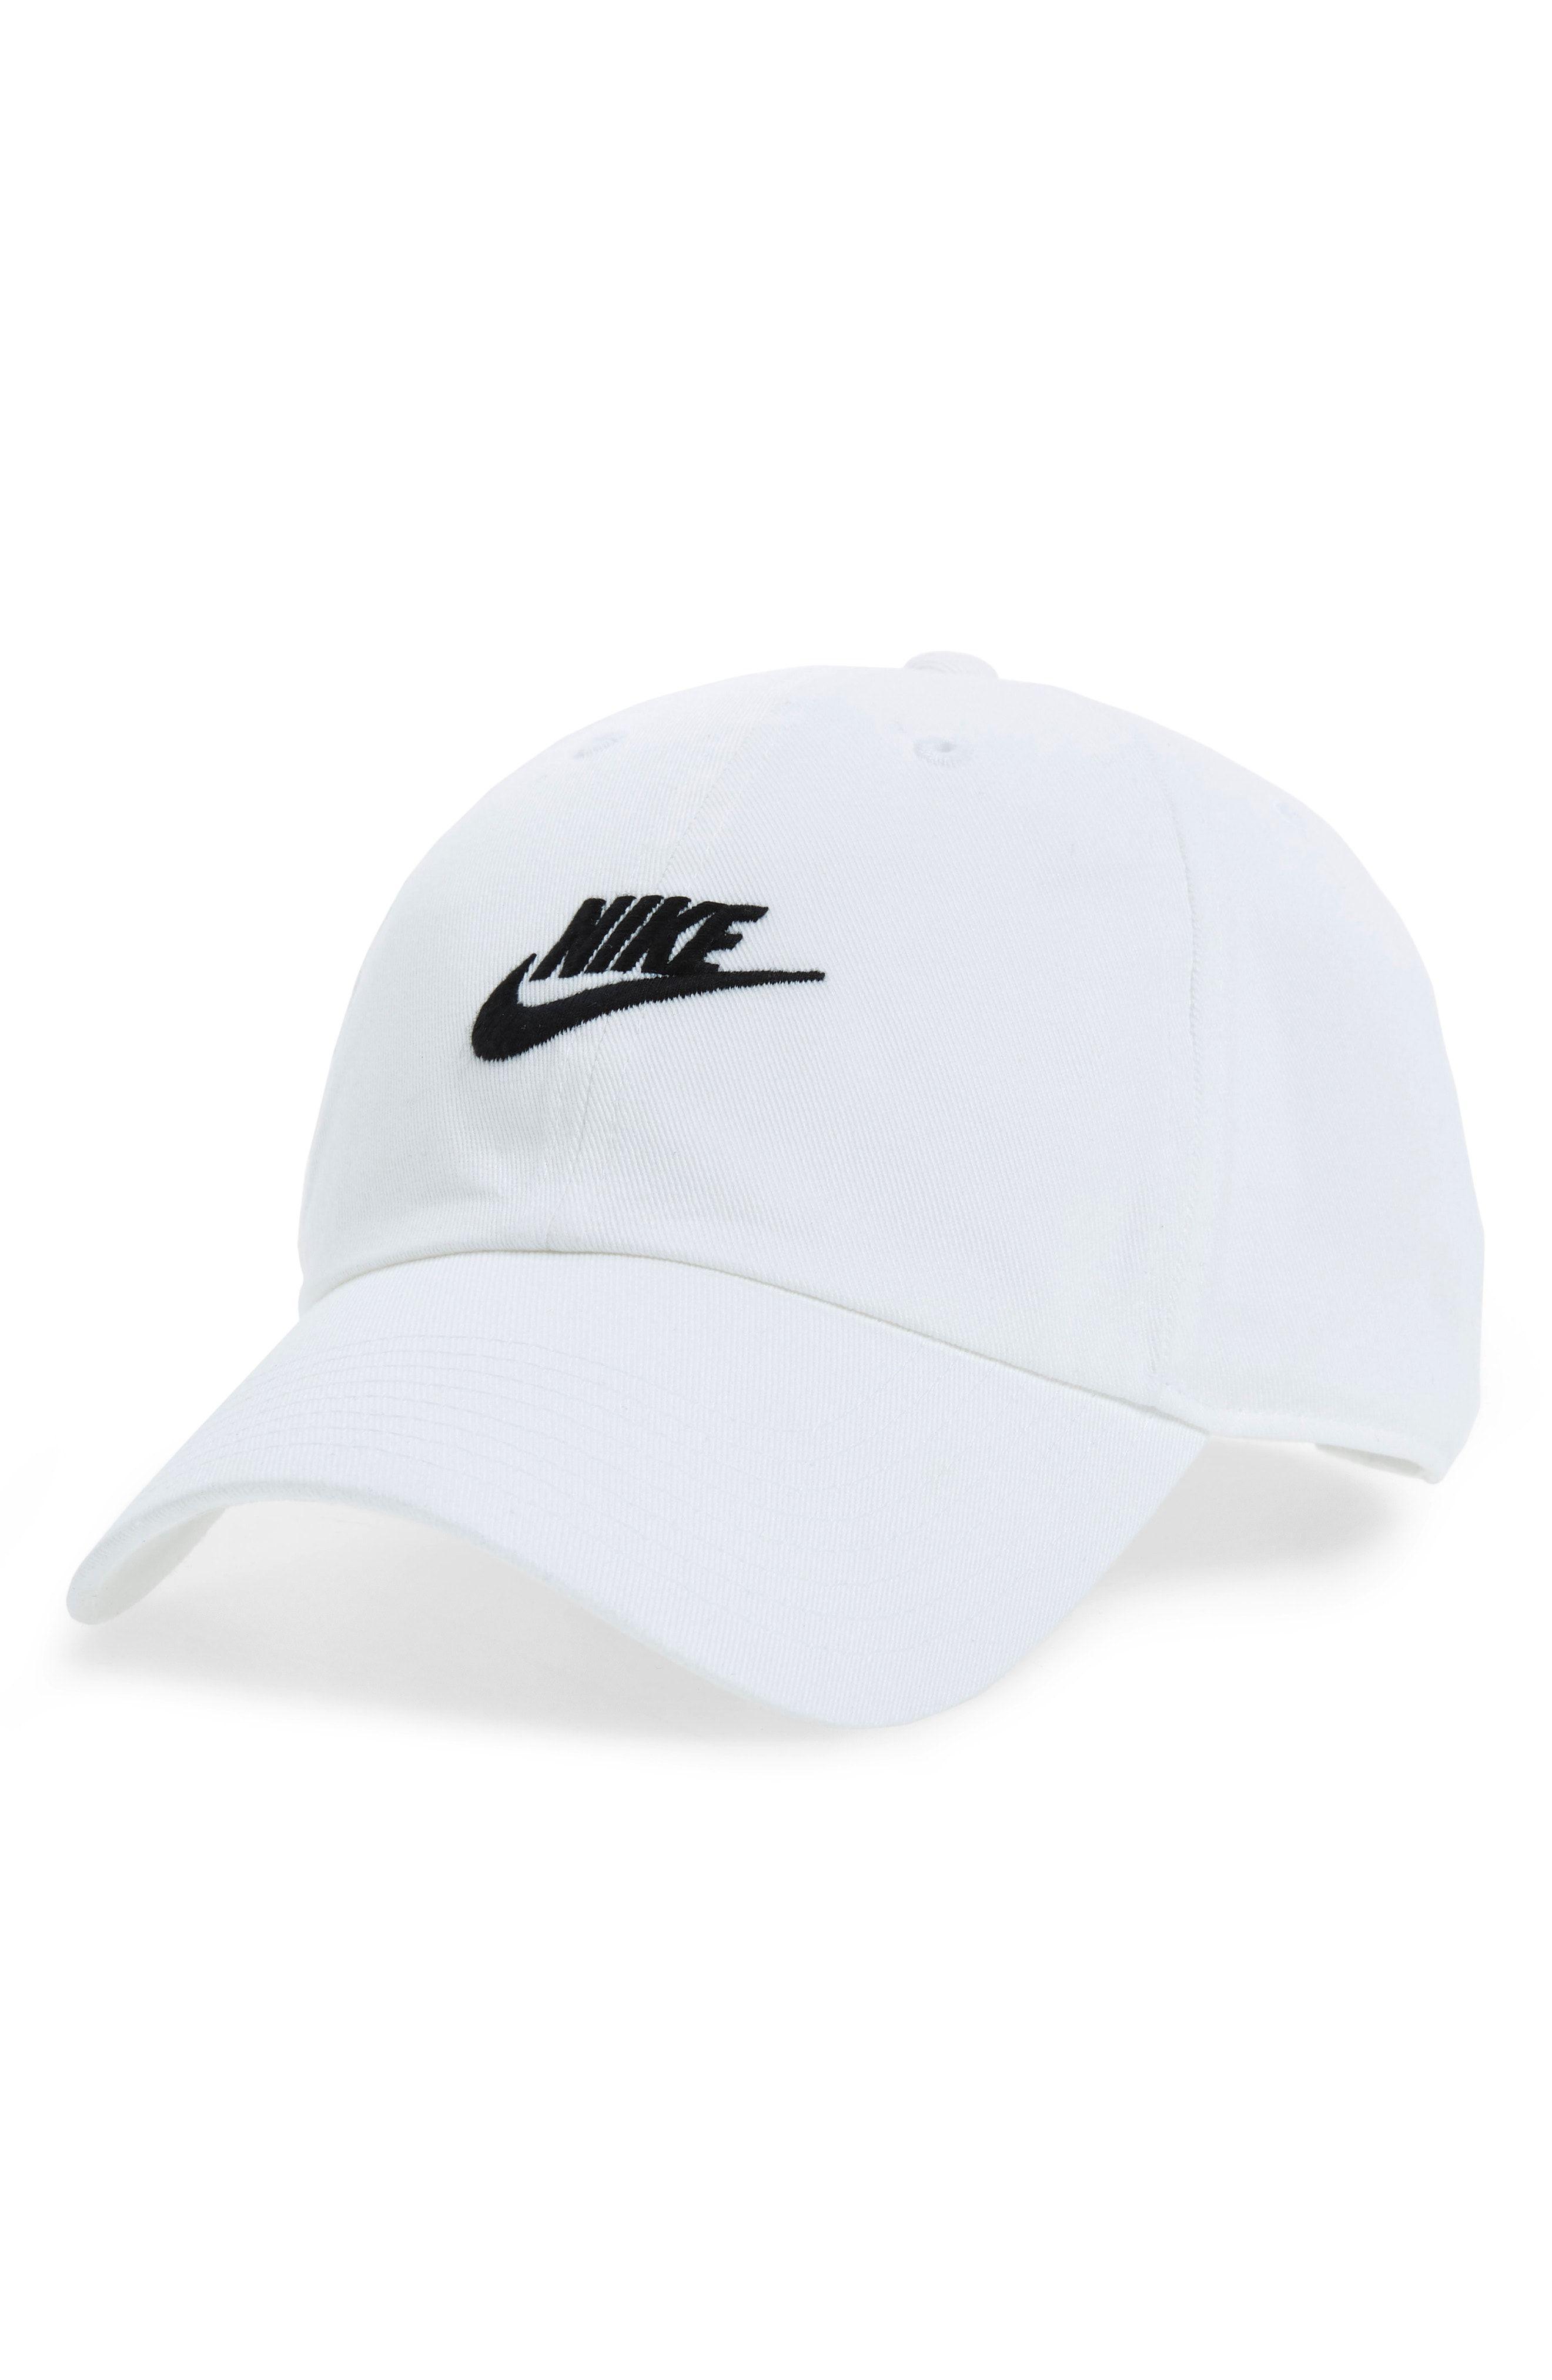 0f3f1760c3762f NIKE FUTURA WASHED CAP - WHITE.  nike